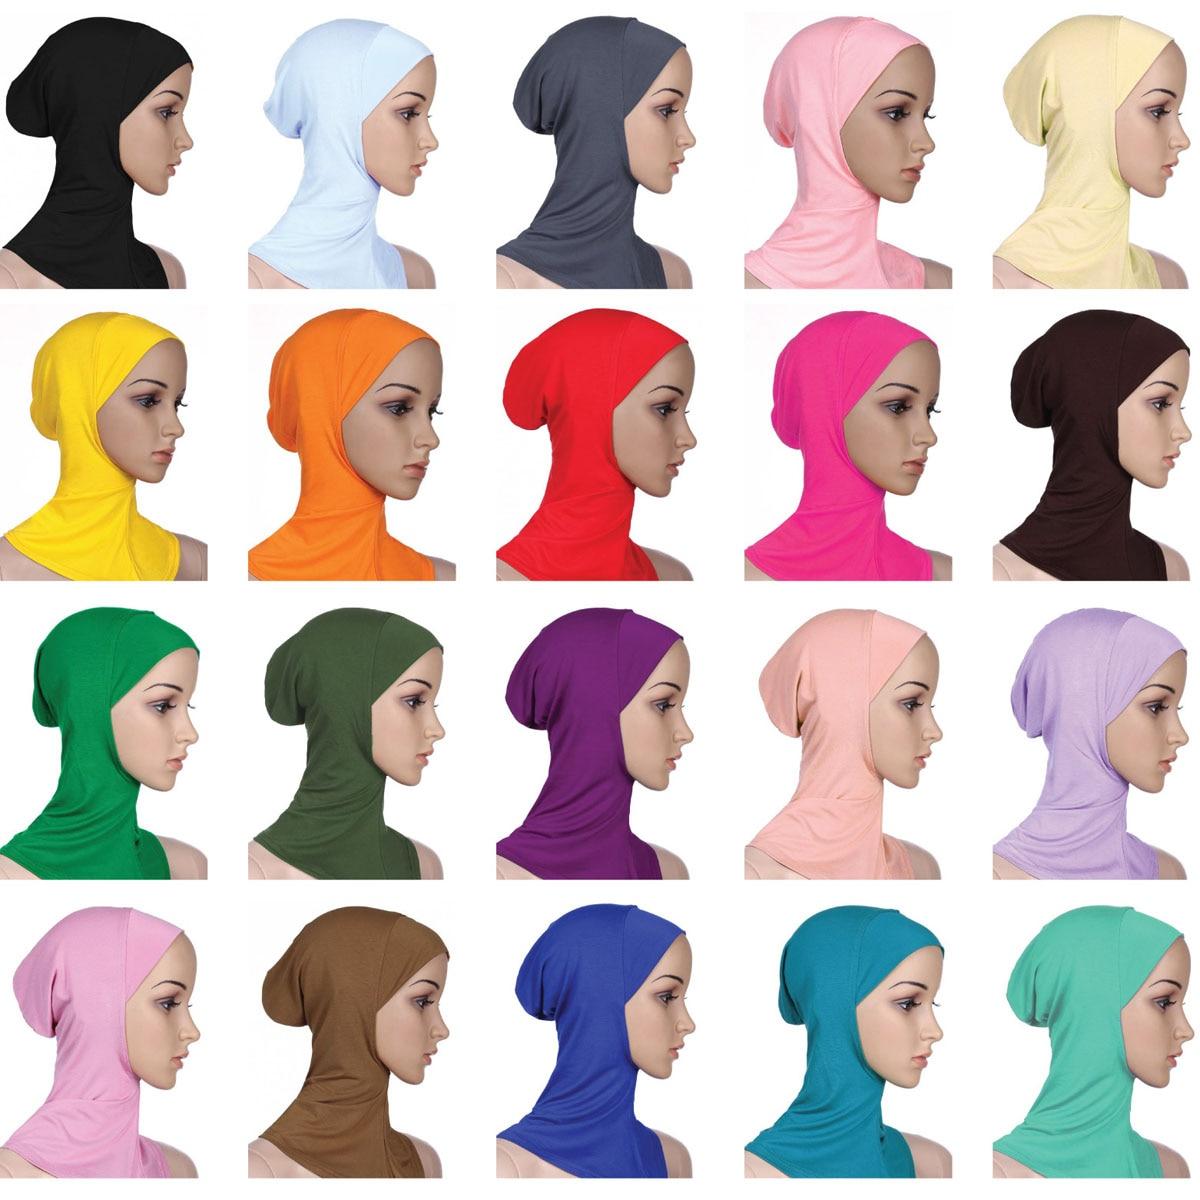 Soft Under Scarf Hat Cap Bone Bonnet Hijab Islamic Head Wear Neck  Full Cover Inner Muslim Lady Elastic Ninja Women Headwear CapsIslamic  Clothing